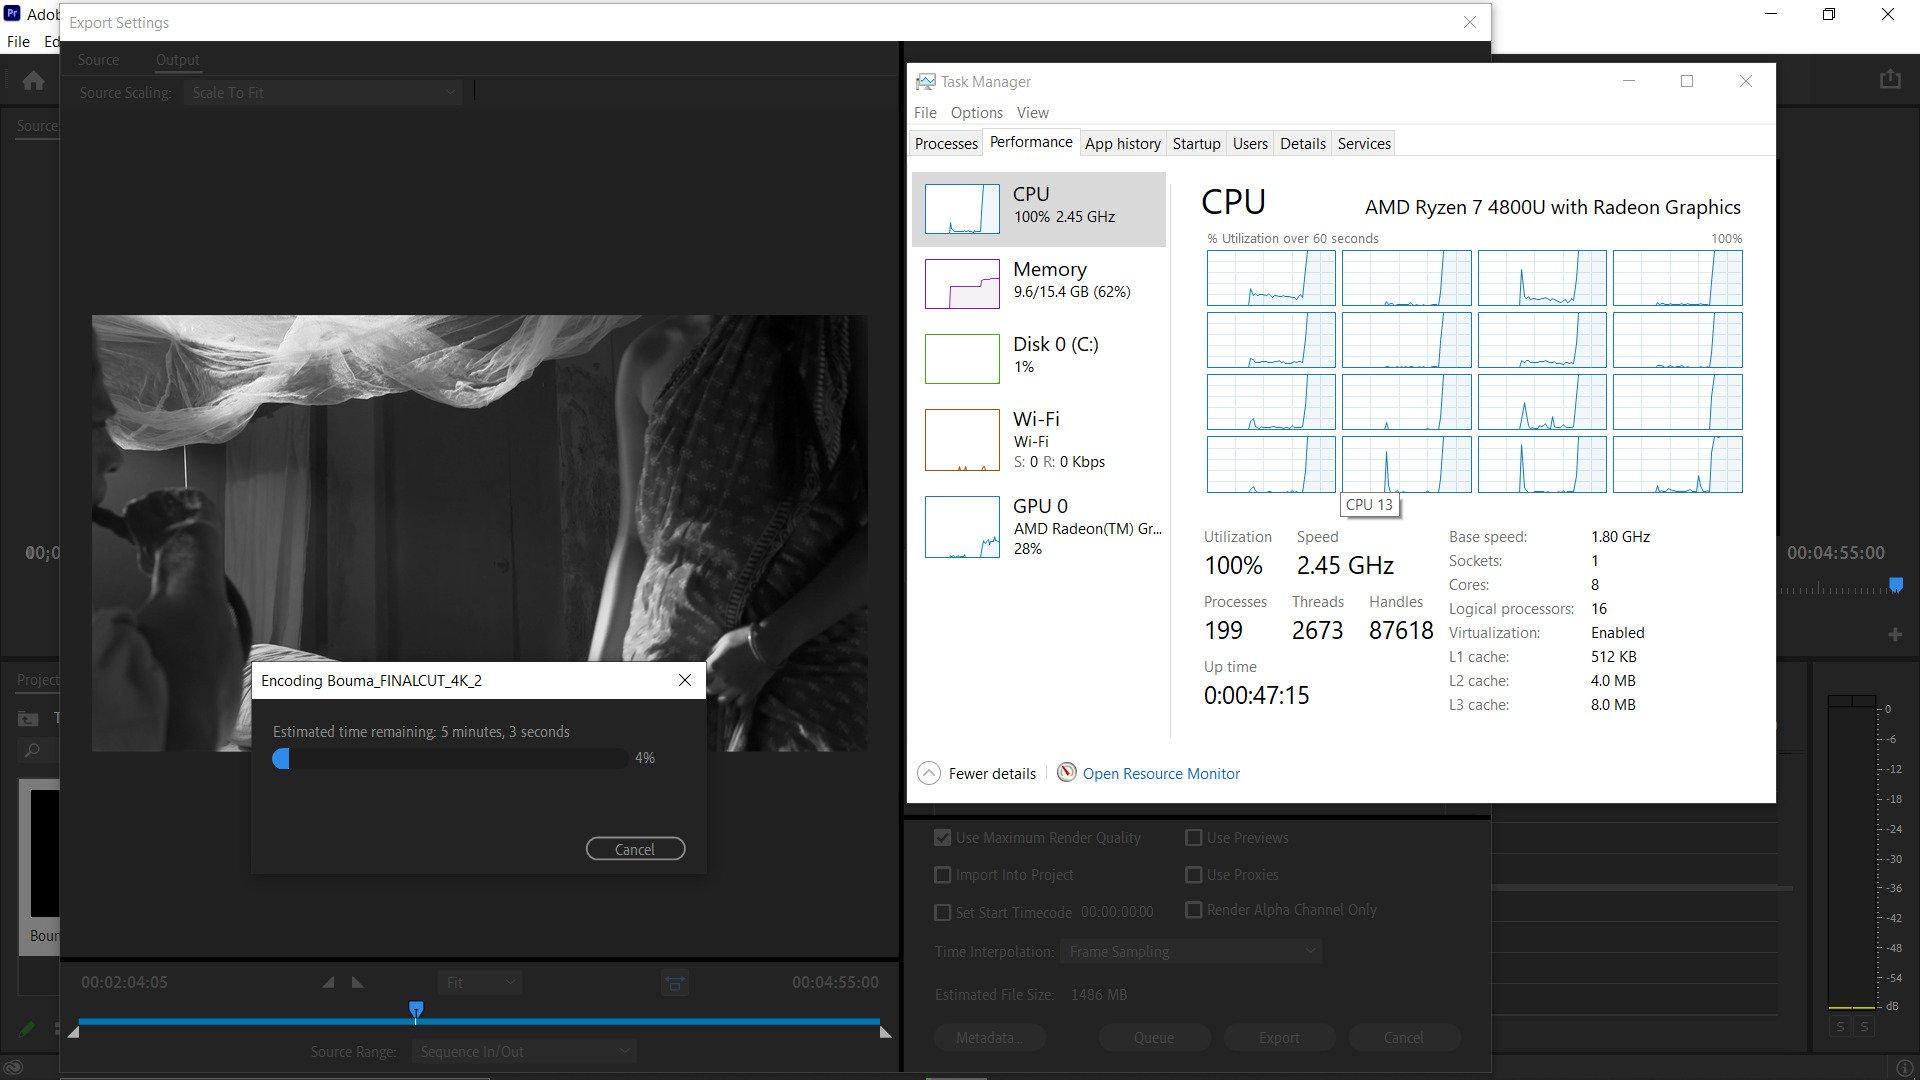 Lenovo Ideapad Slim 7 - AMD Ryzen 7 4800U CPU Encode